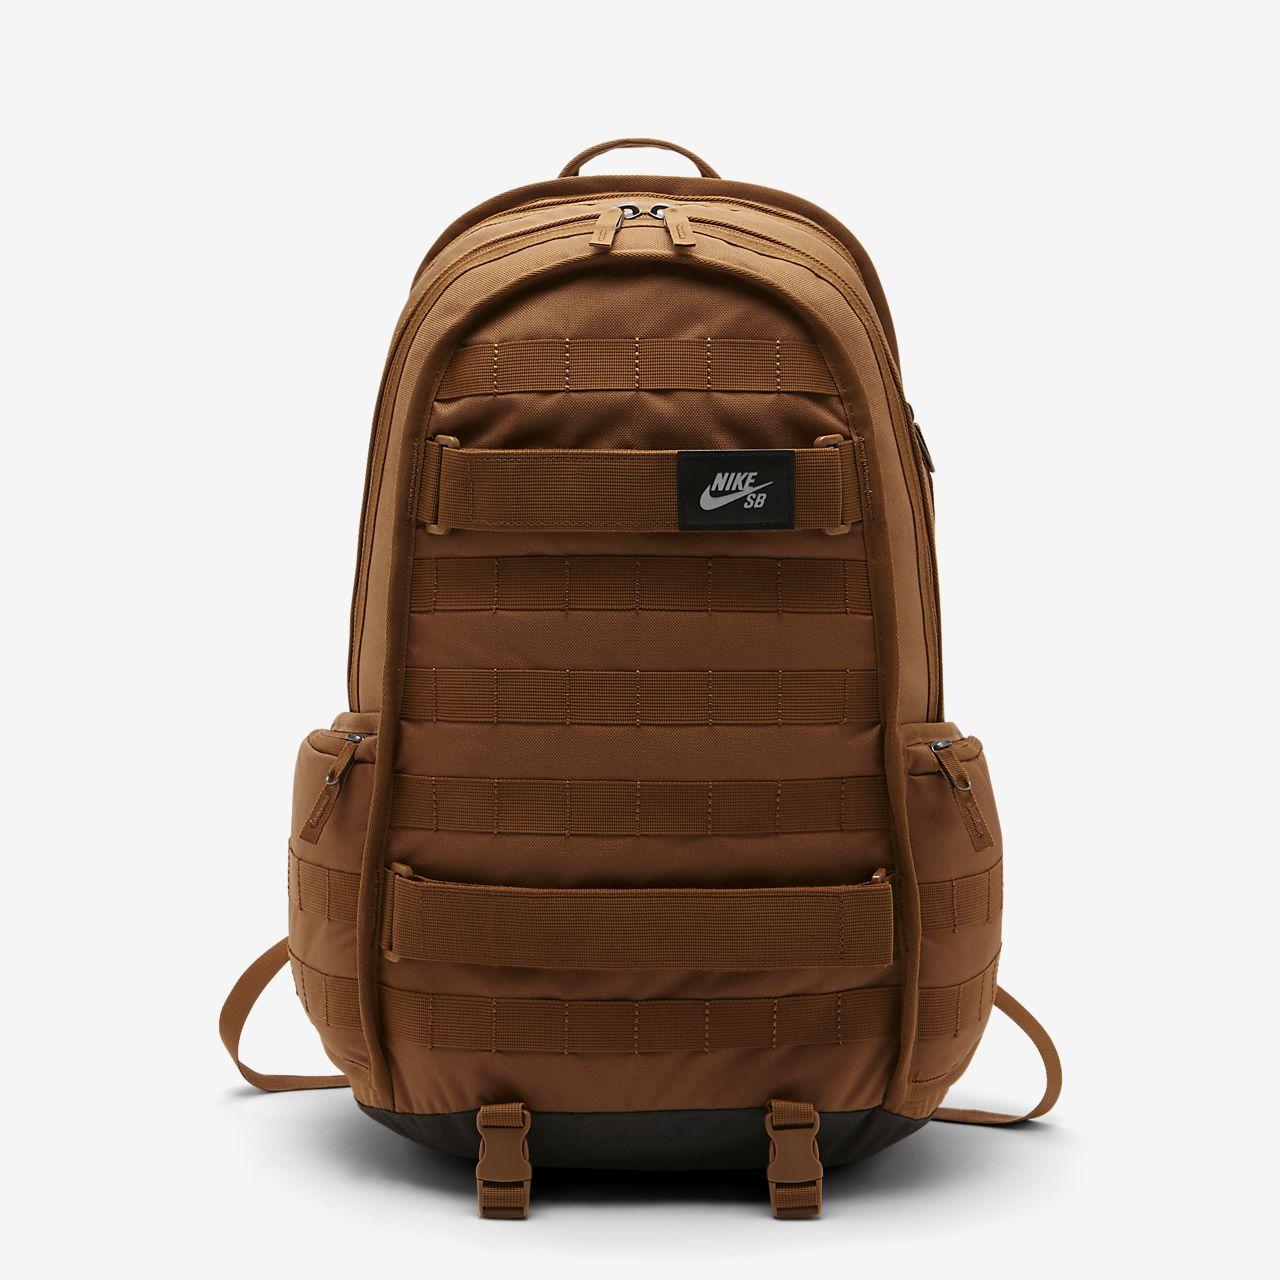 973f9ca828 light blue nike backpack Sale